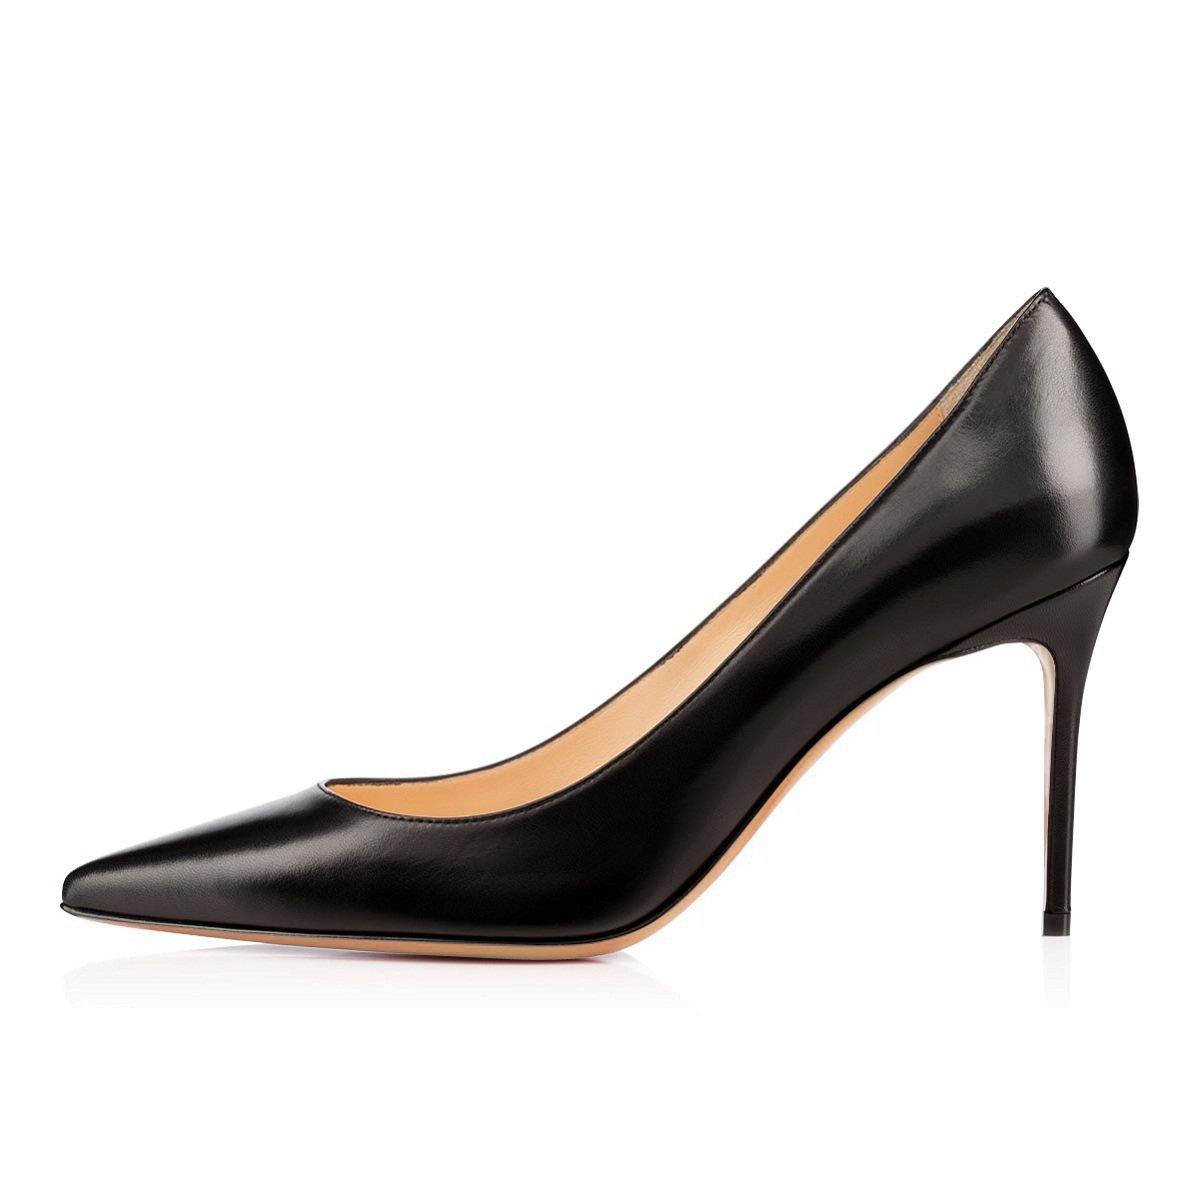 EDEFS Femme Escarpins Talon Aiguille En PU Cuir Verni Classique Mode Soiree Mariage Chaussures